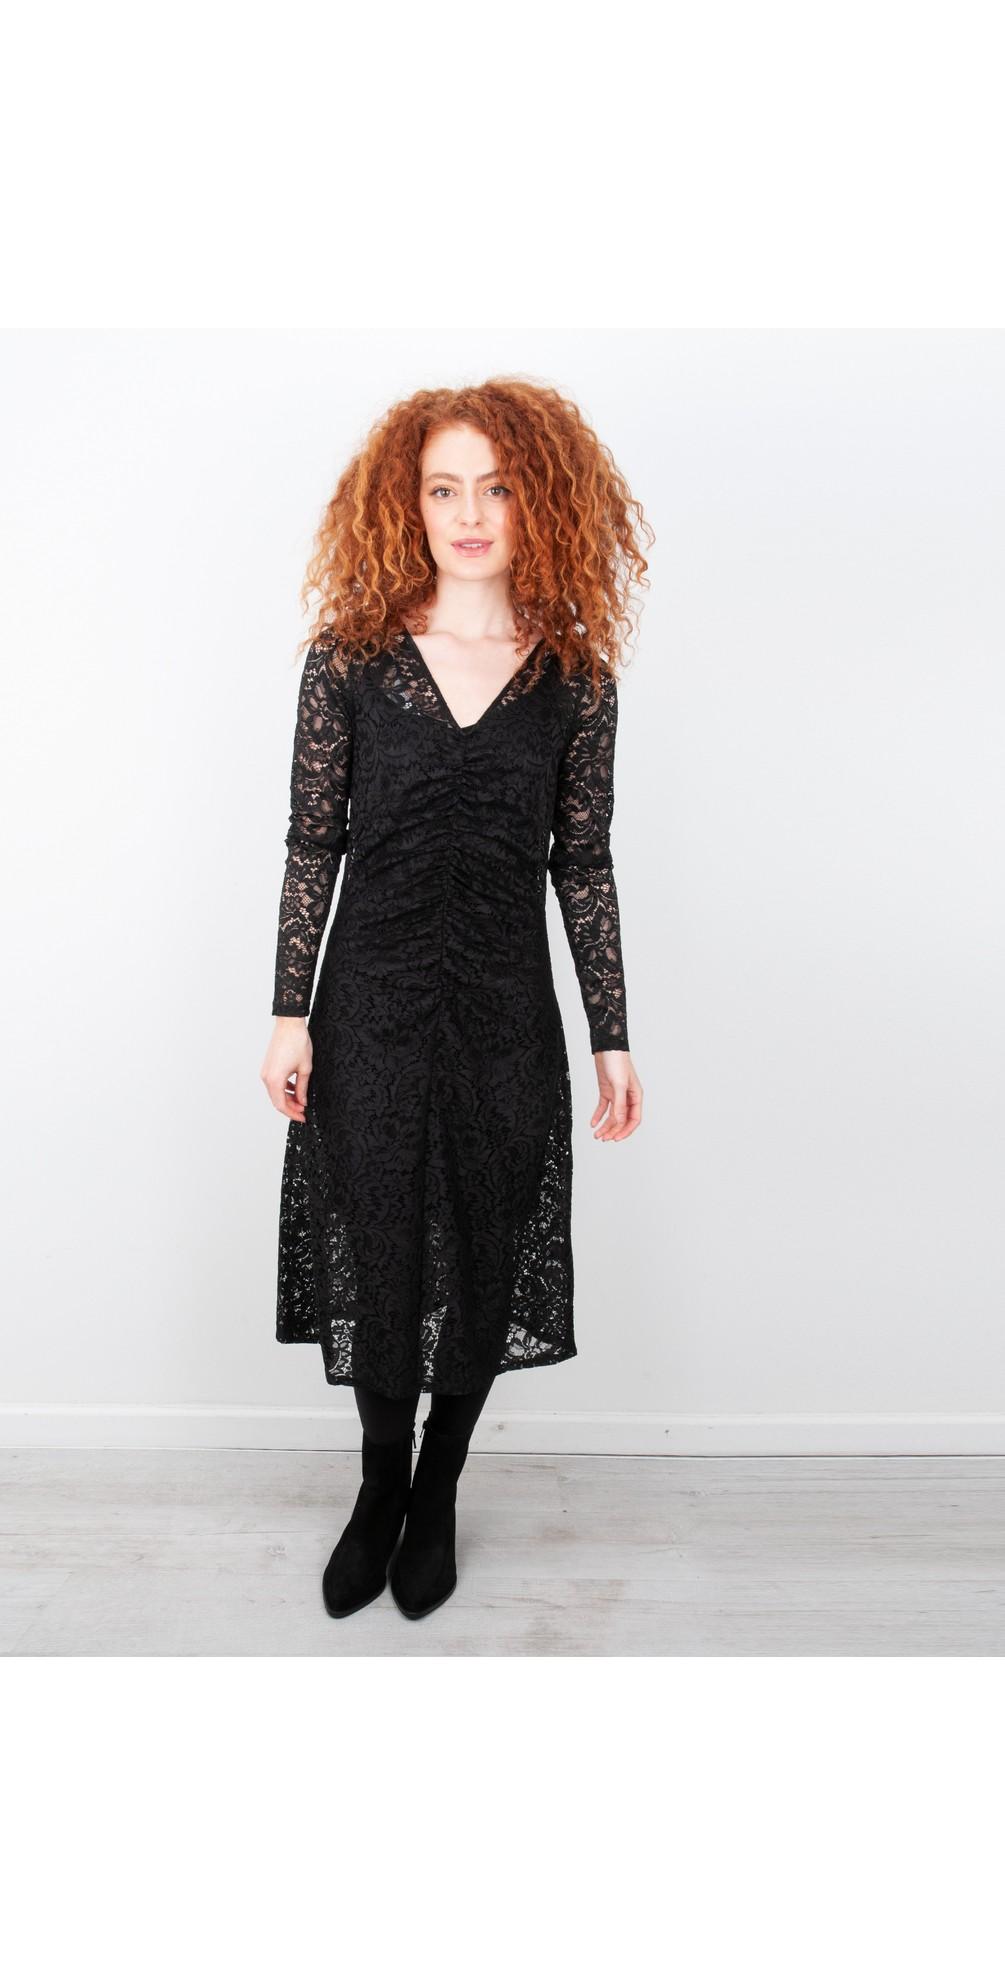 Manacore Lace Dress main image